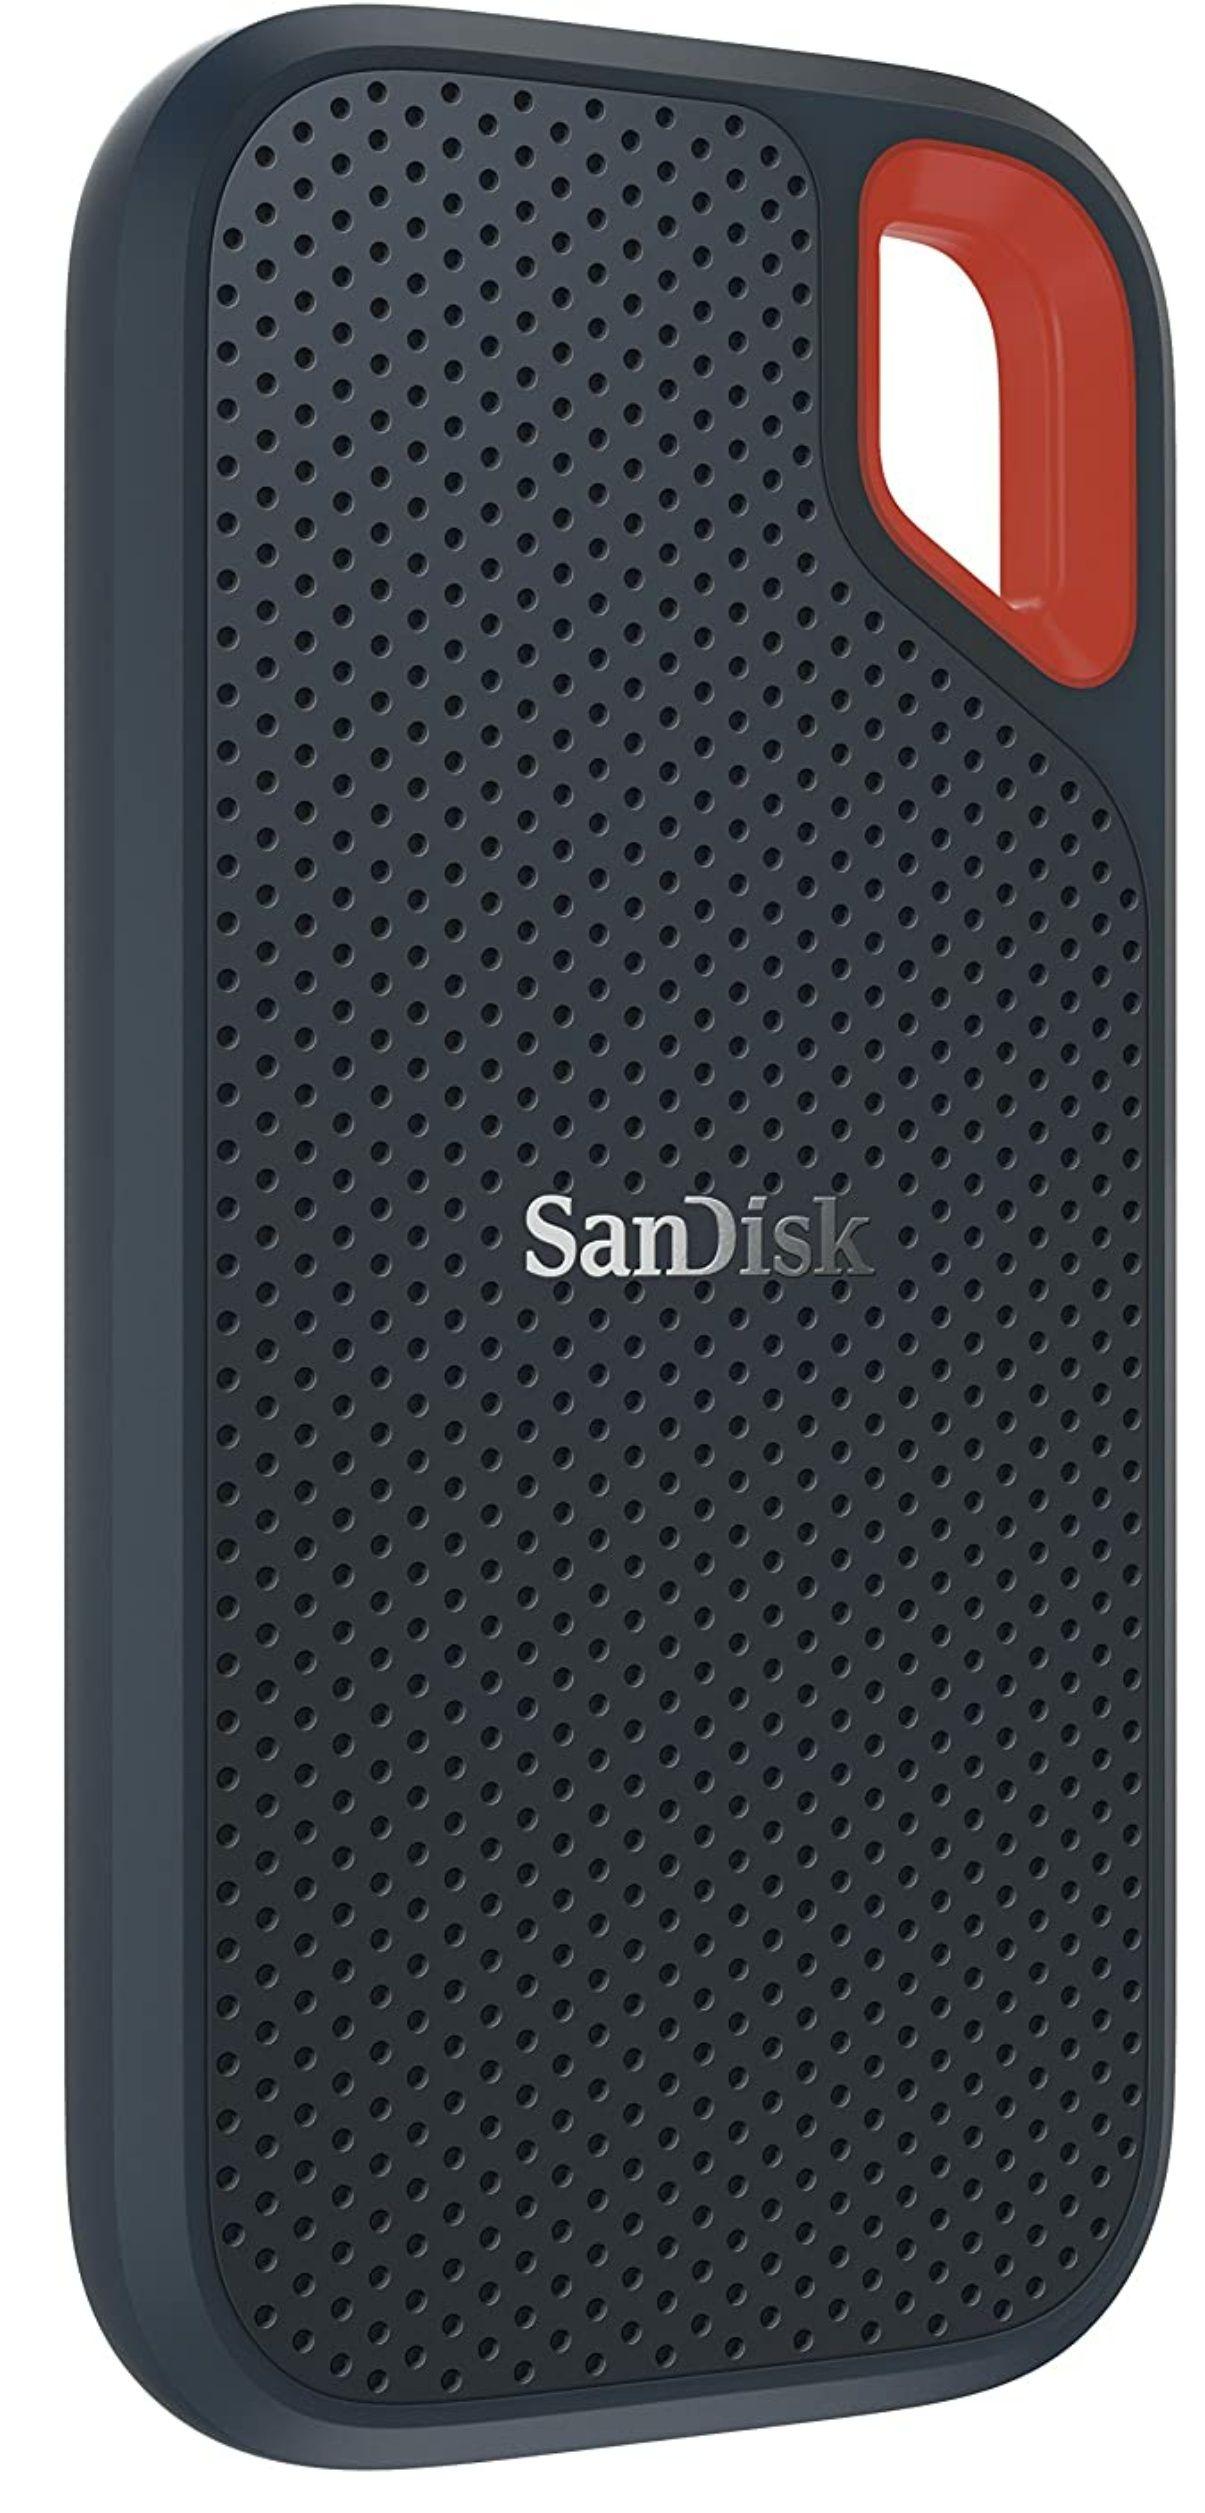 Portable 2 TB ssd sandisk